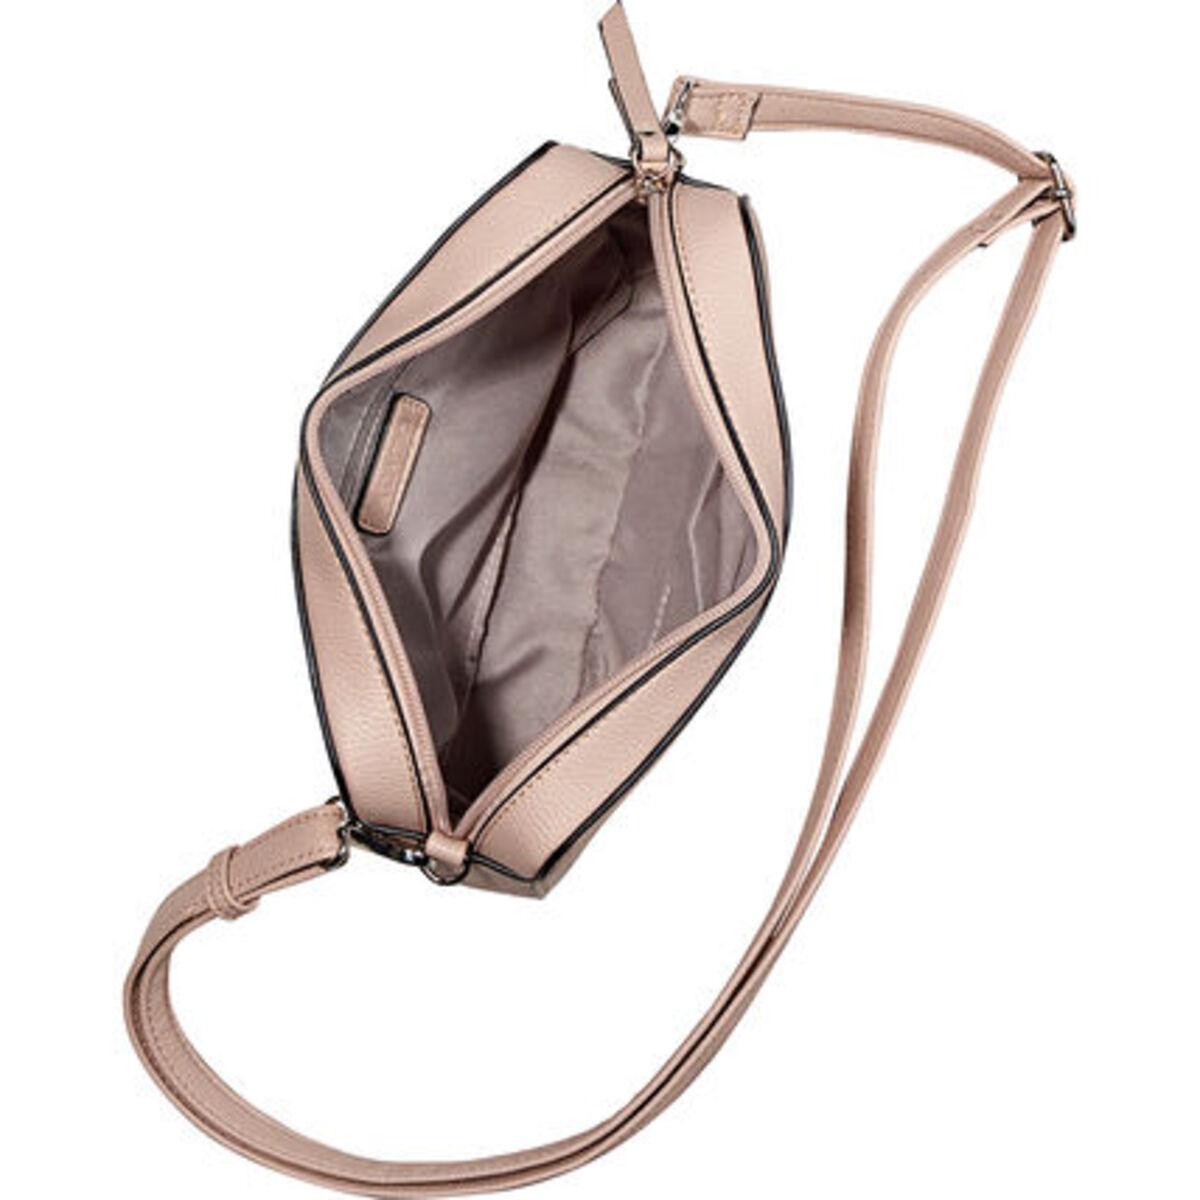 Bild 3 von Adagio Damen Crossbag